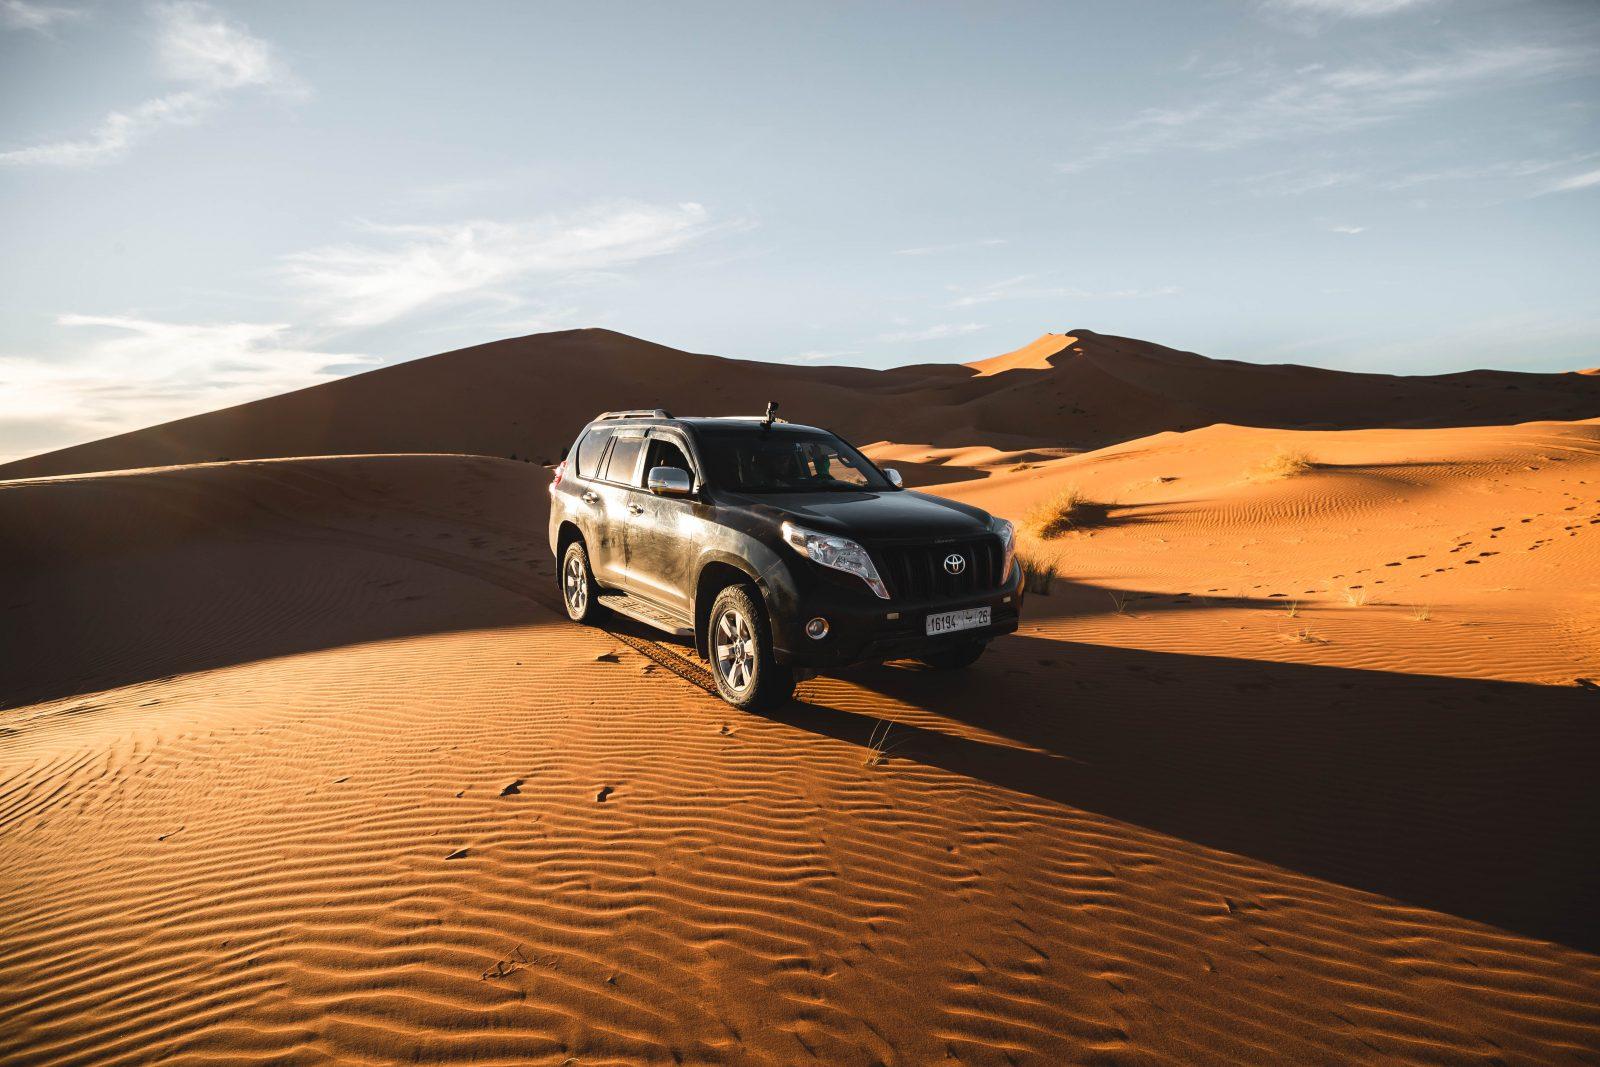 4wd desert drive